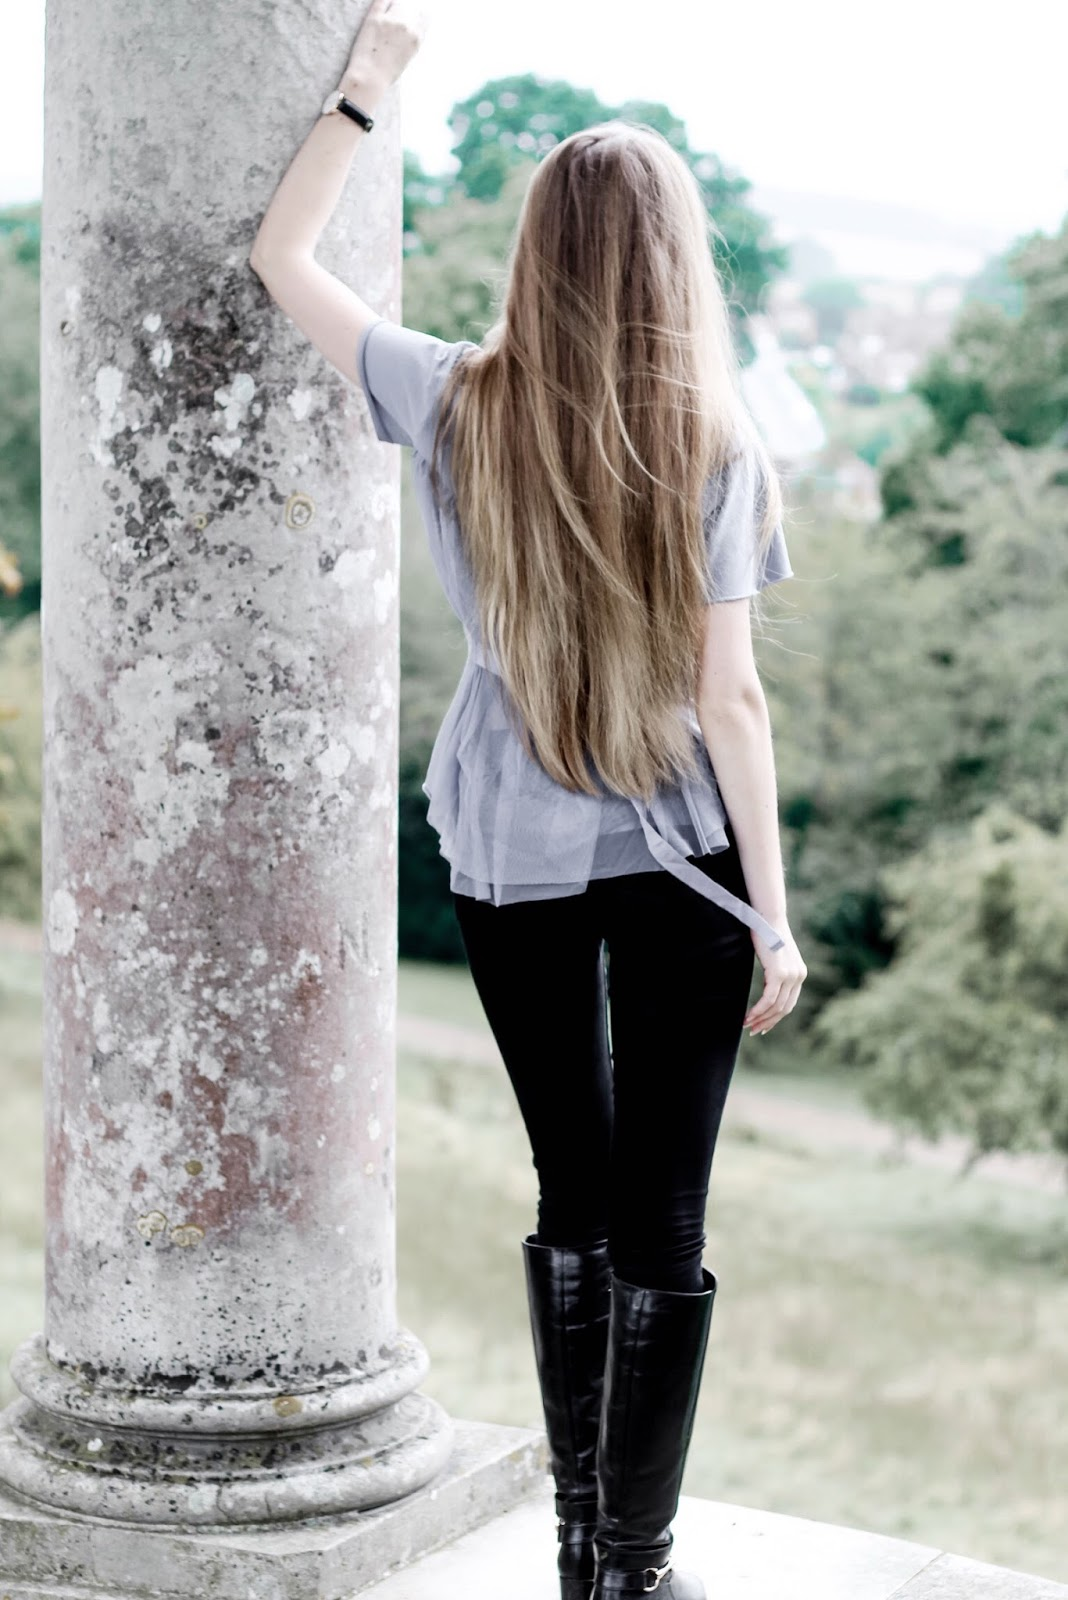 UK Fashion Blog Black Riding Boots Casual Autumn Styling